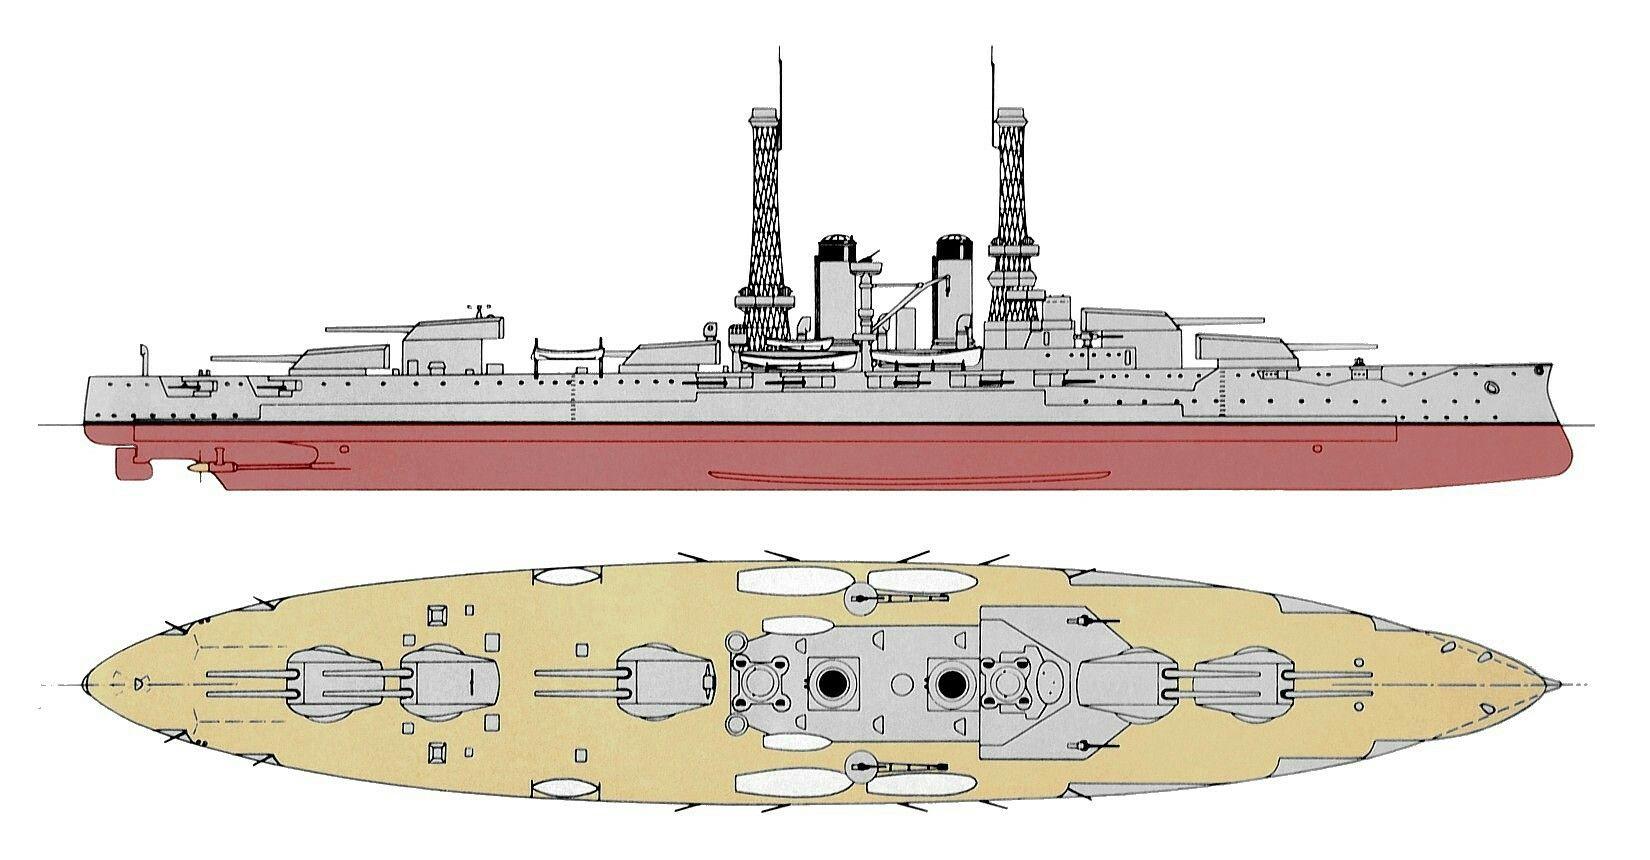 Wwii italy navy battleship roma 1943 plastic model images list - Battleship Cutaways Recherche Google Cutaways Pinterest Battleship And Navy Ships